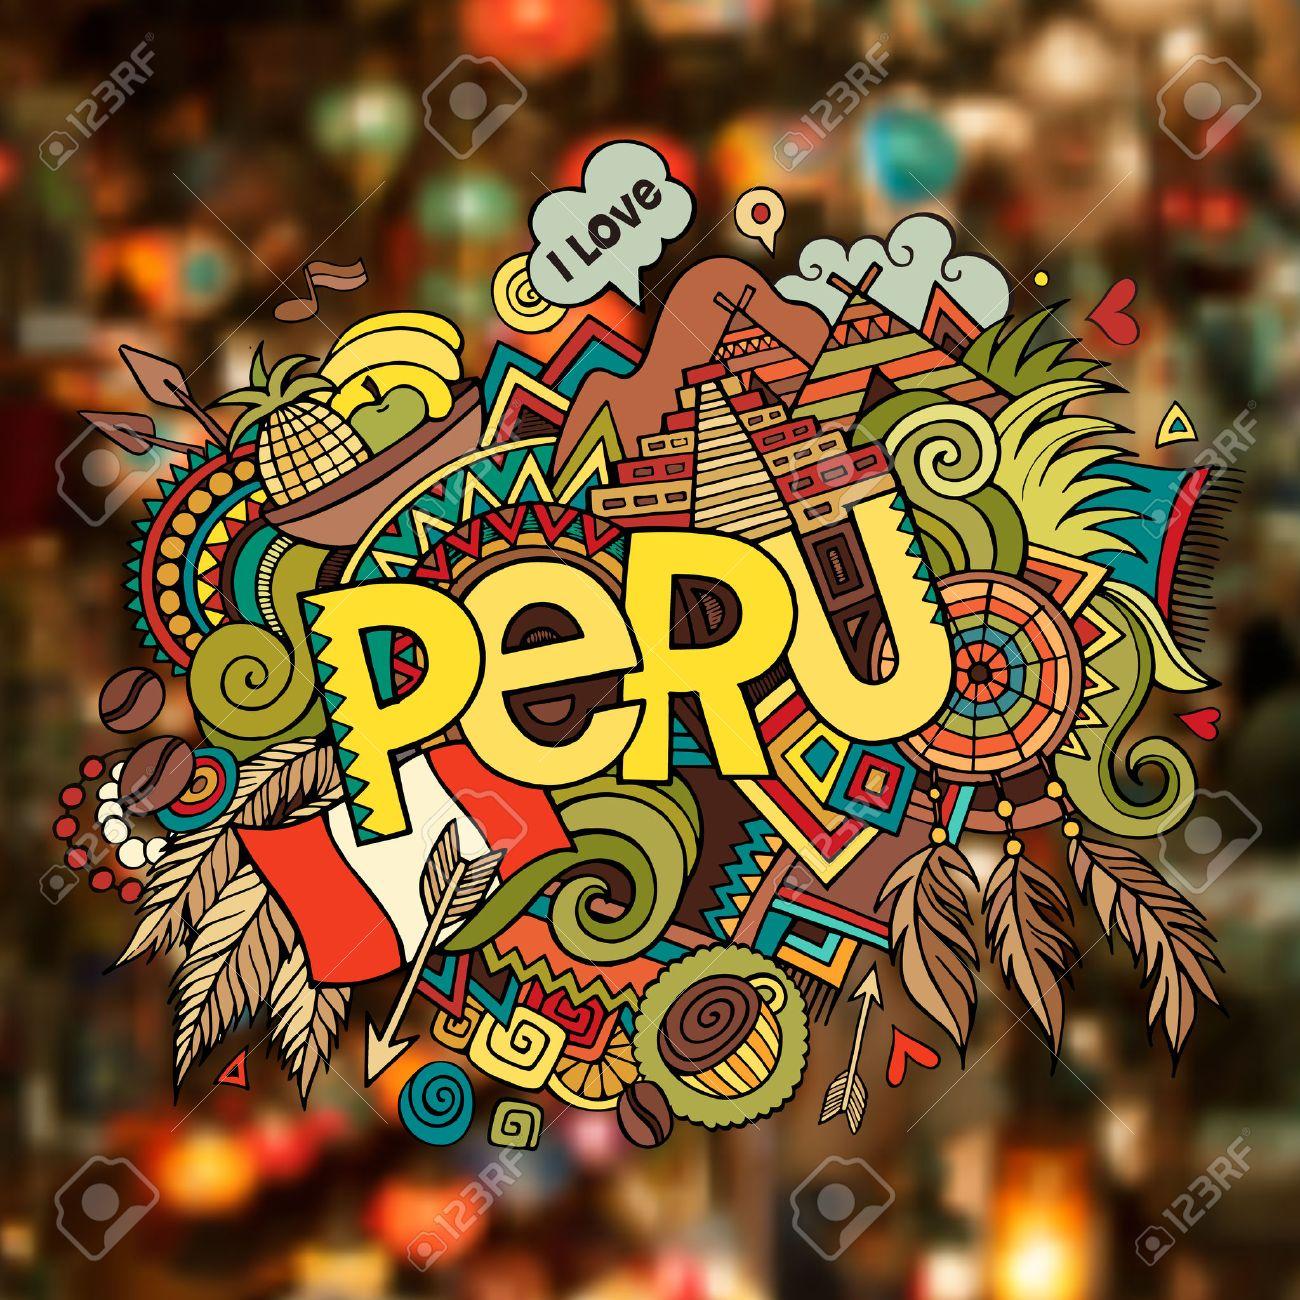 Peru hand lettering and doodles elements background. Vector illustration - 41699347